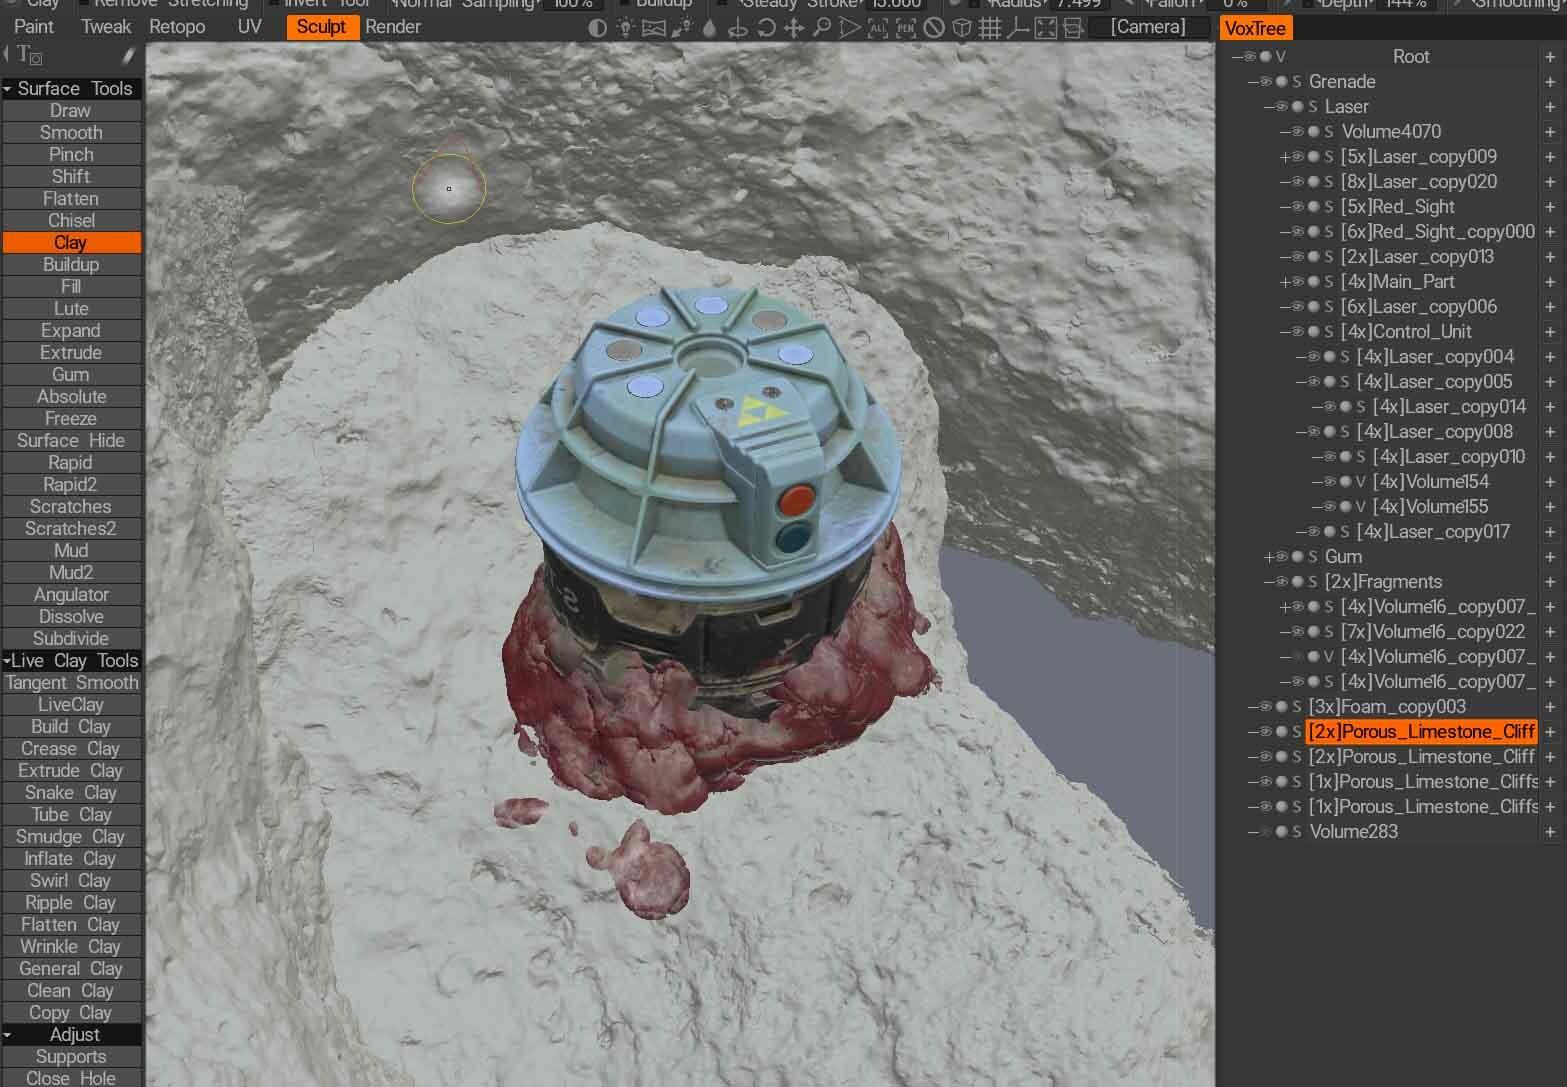 Anton tenitsky lasermine screenshot